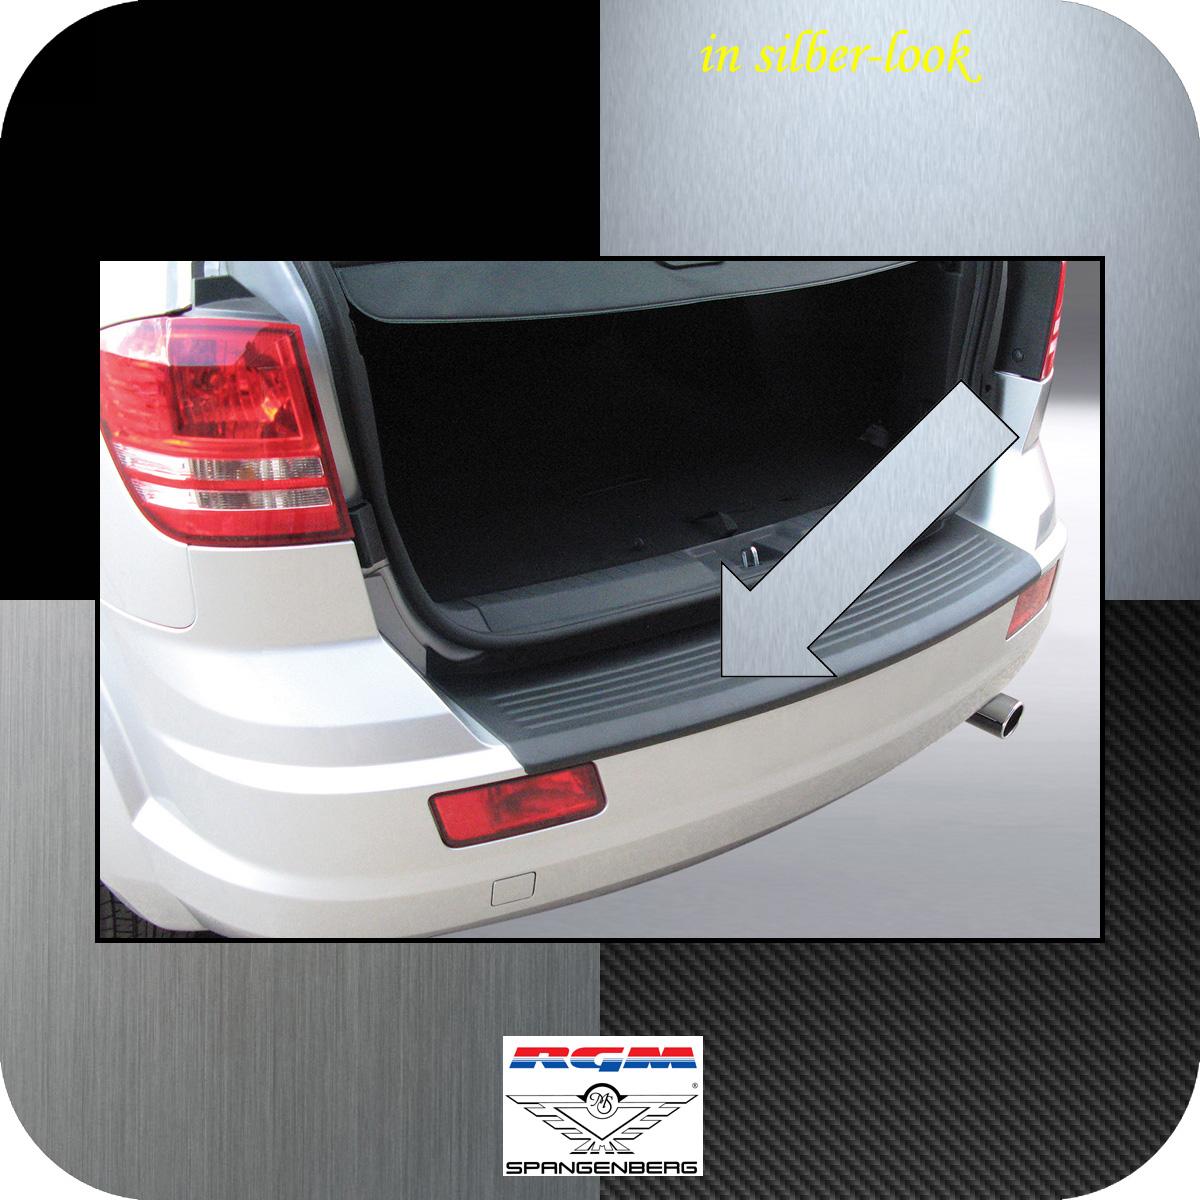 Ladekantenschutz Silber-Look Dodge Journey SUV vor facelift 2007-2011 3506267